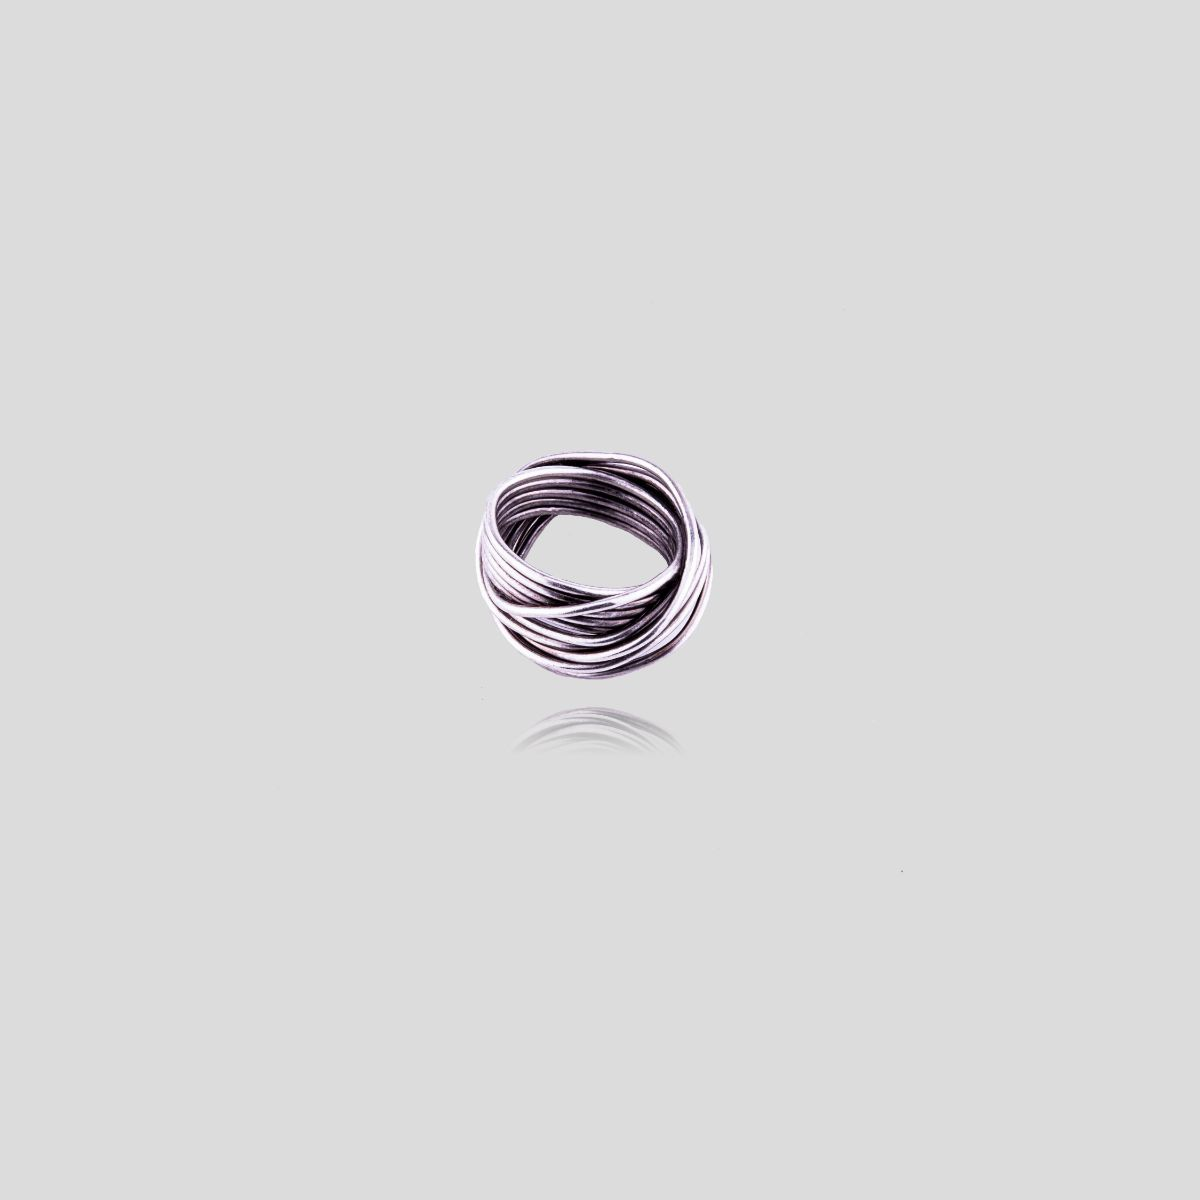 Laurel silver zamak ring with original design as a metal coil